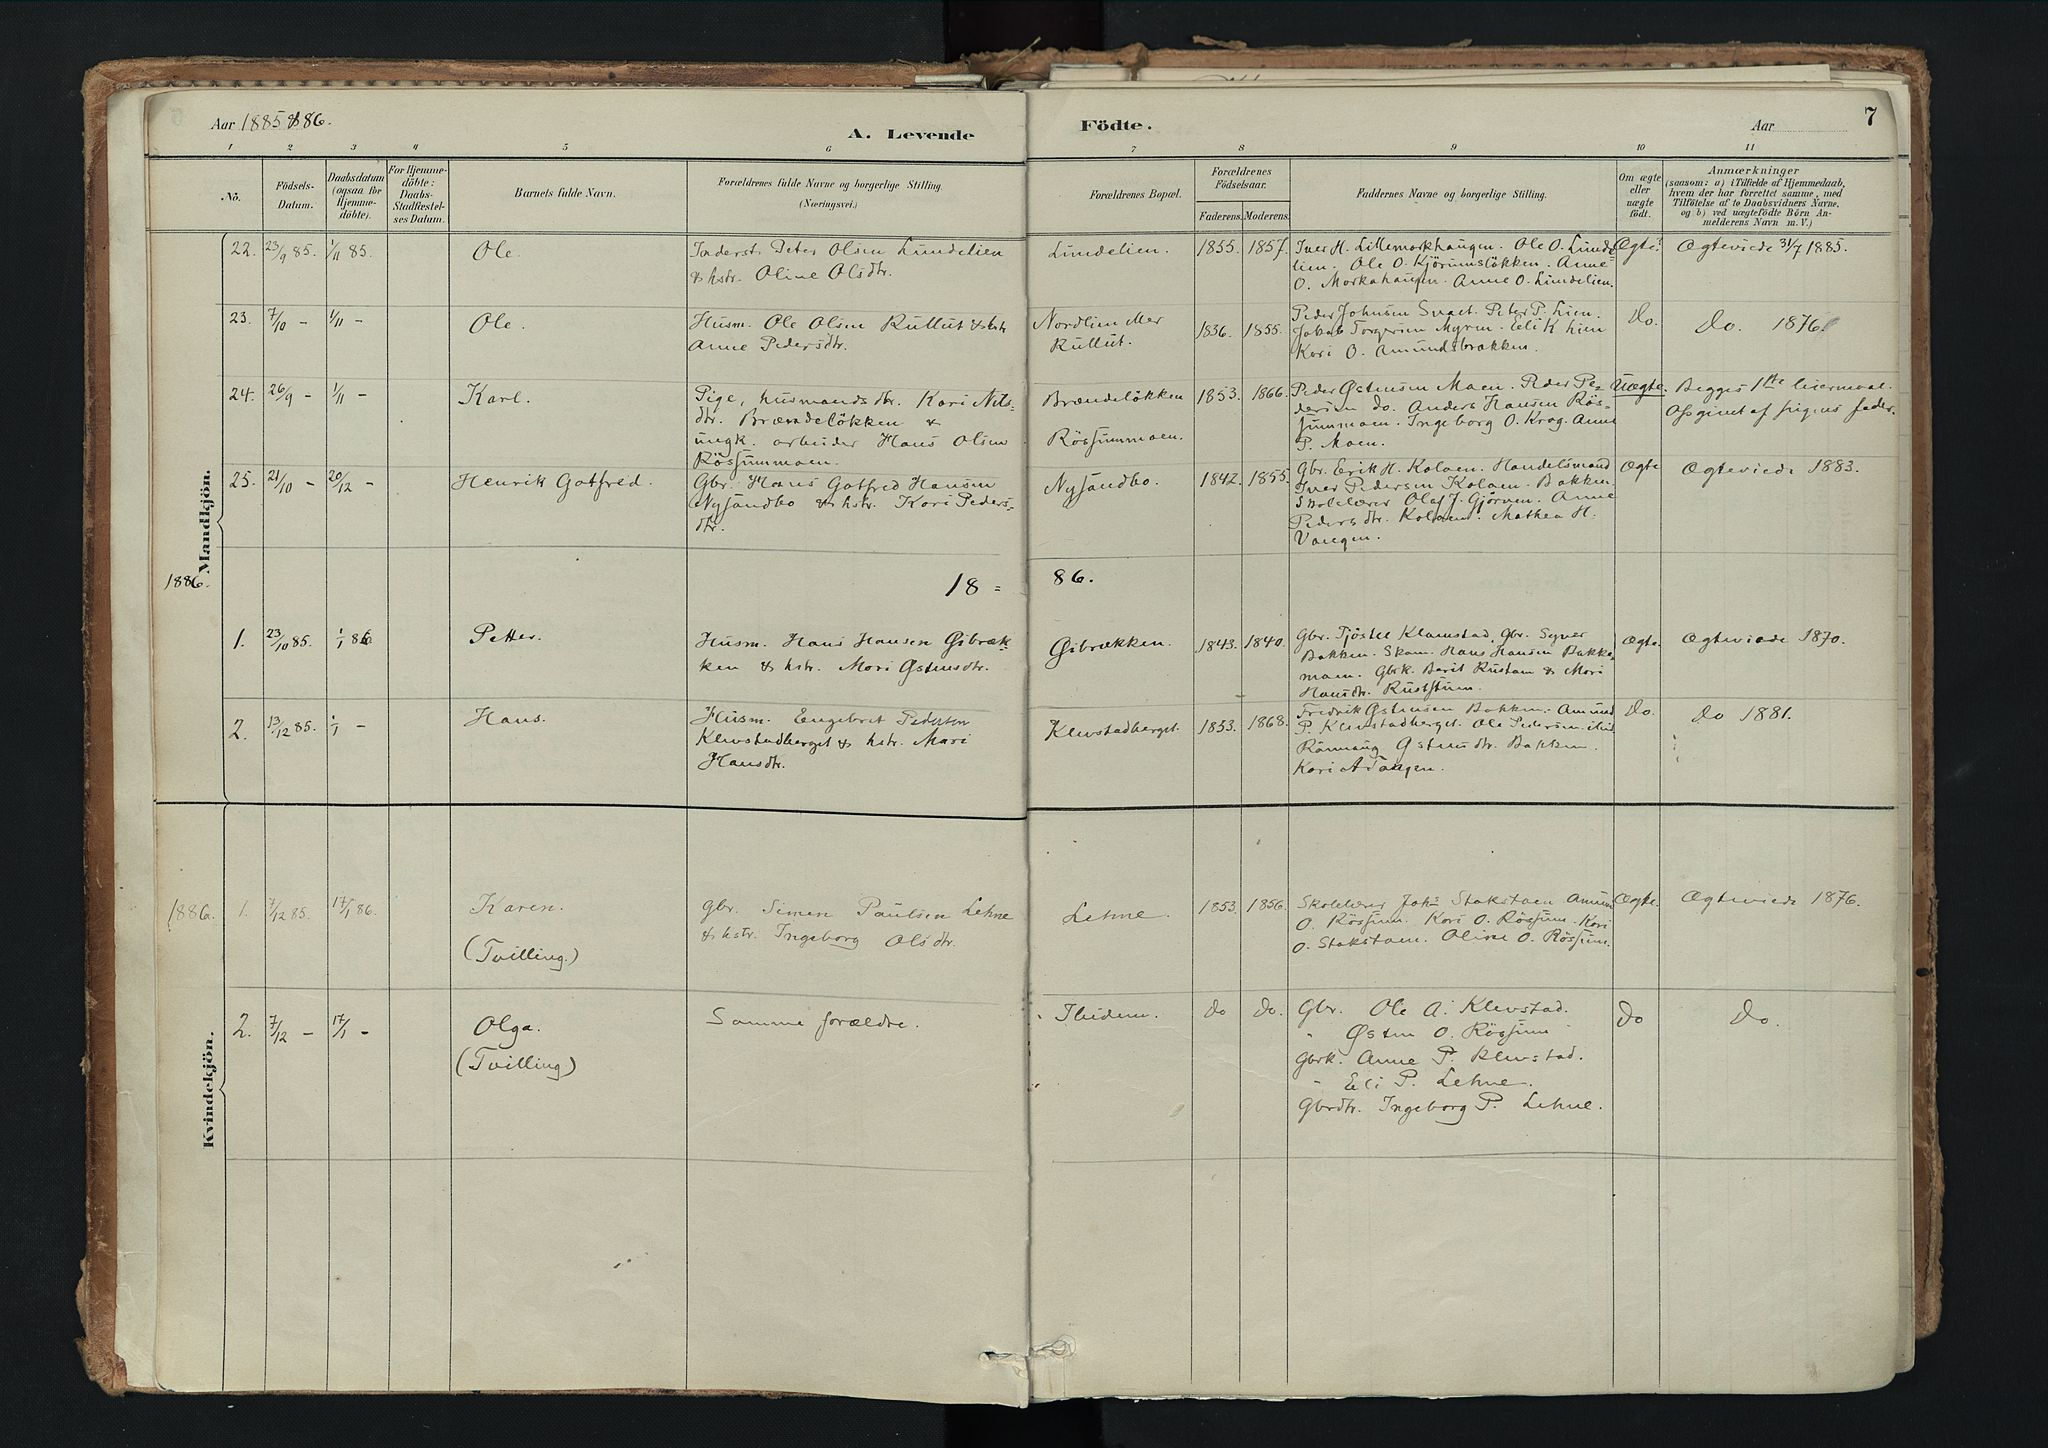 SAH, Nord-Fron prestekontor, Ministerialbok nr. 3, 1884-1914, s. 7